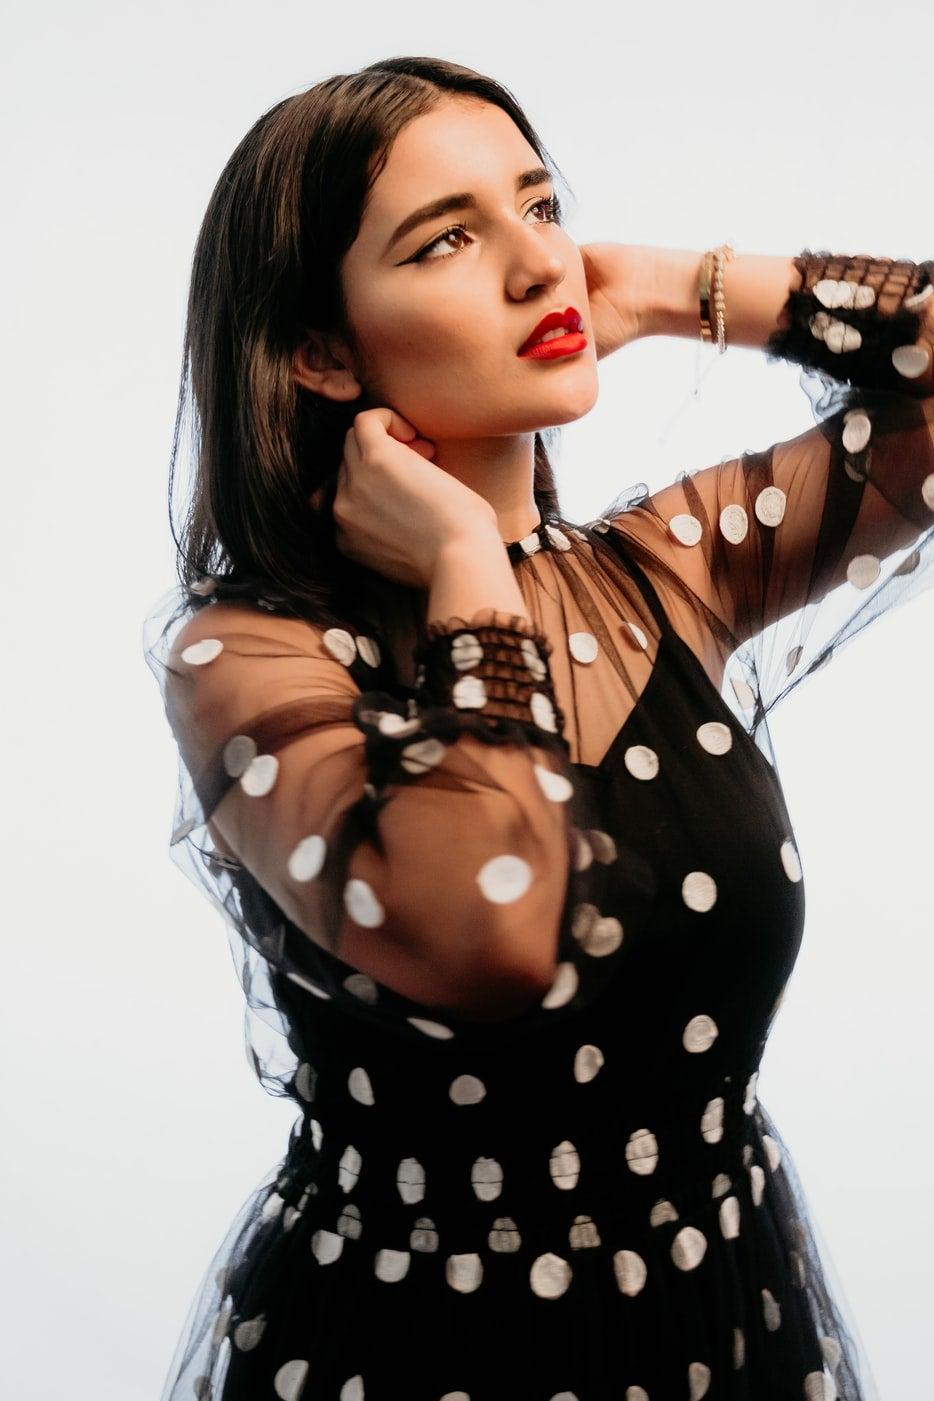 woman in sheer polka dot dress